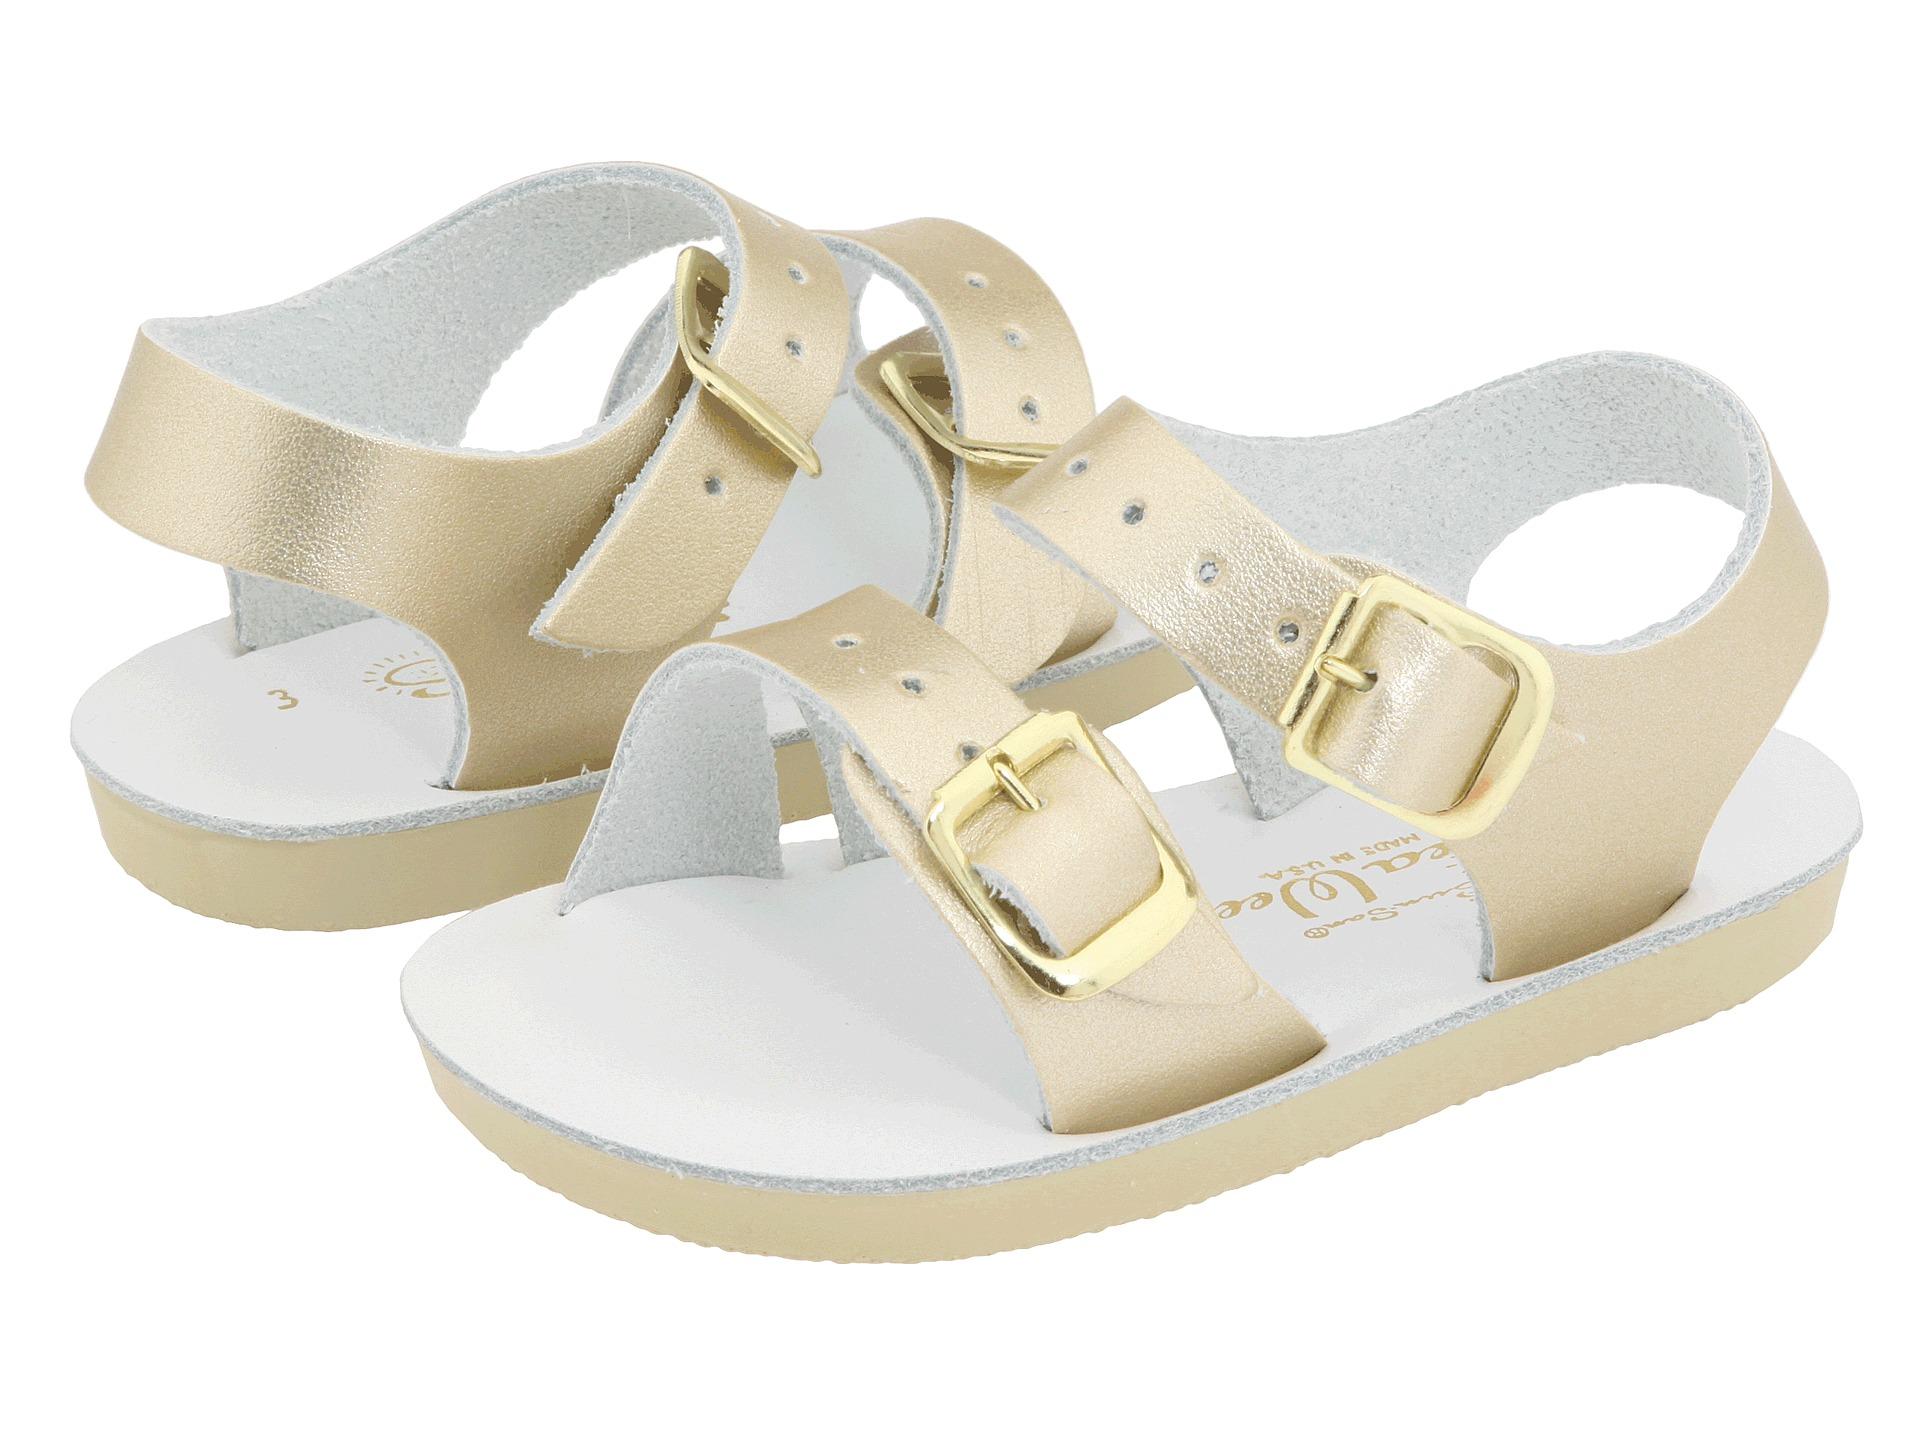 salt water sandal by hoy shoes sun san sea wees infant toddler gold free. Black Bedroom Furniture Sets. Home Design Ideas